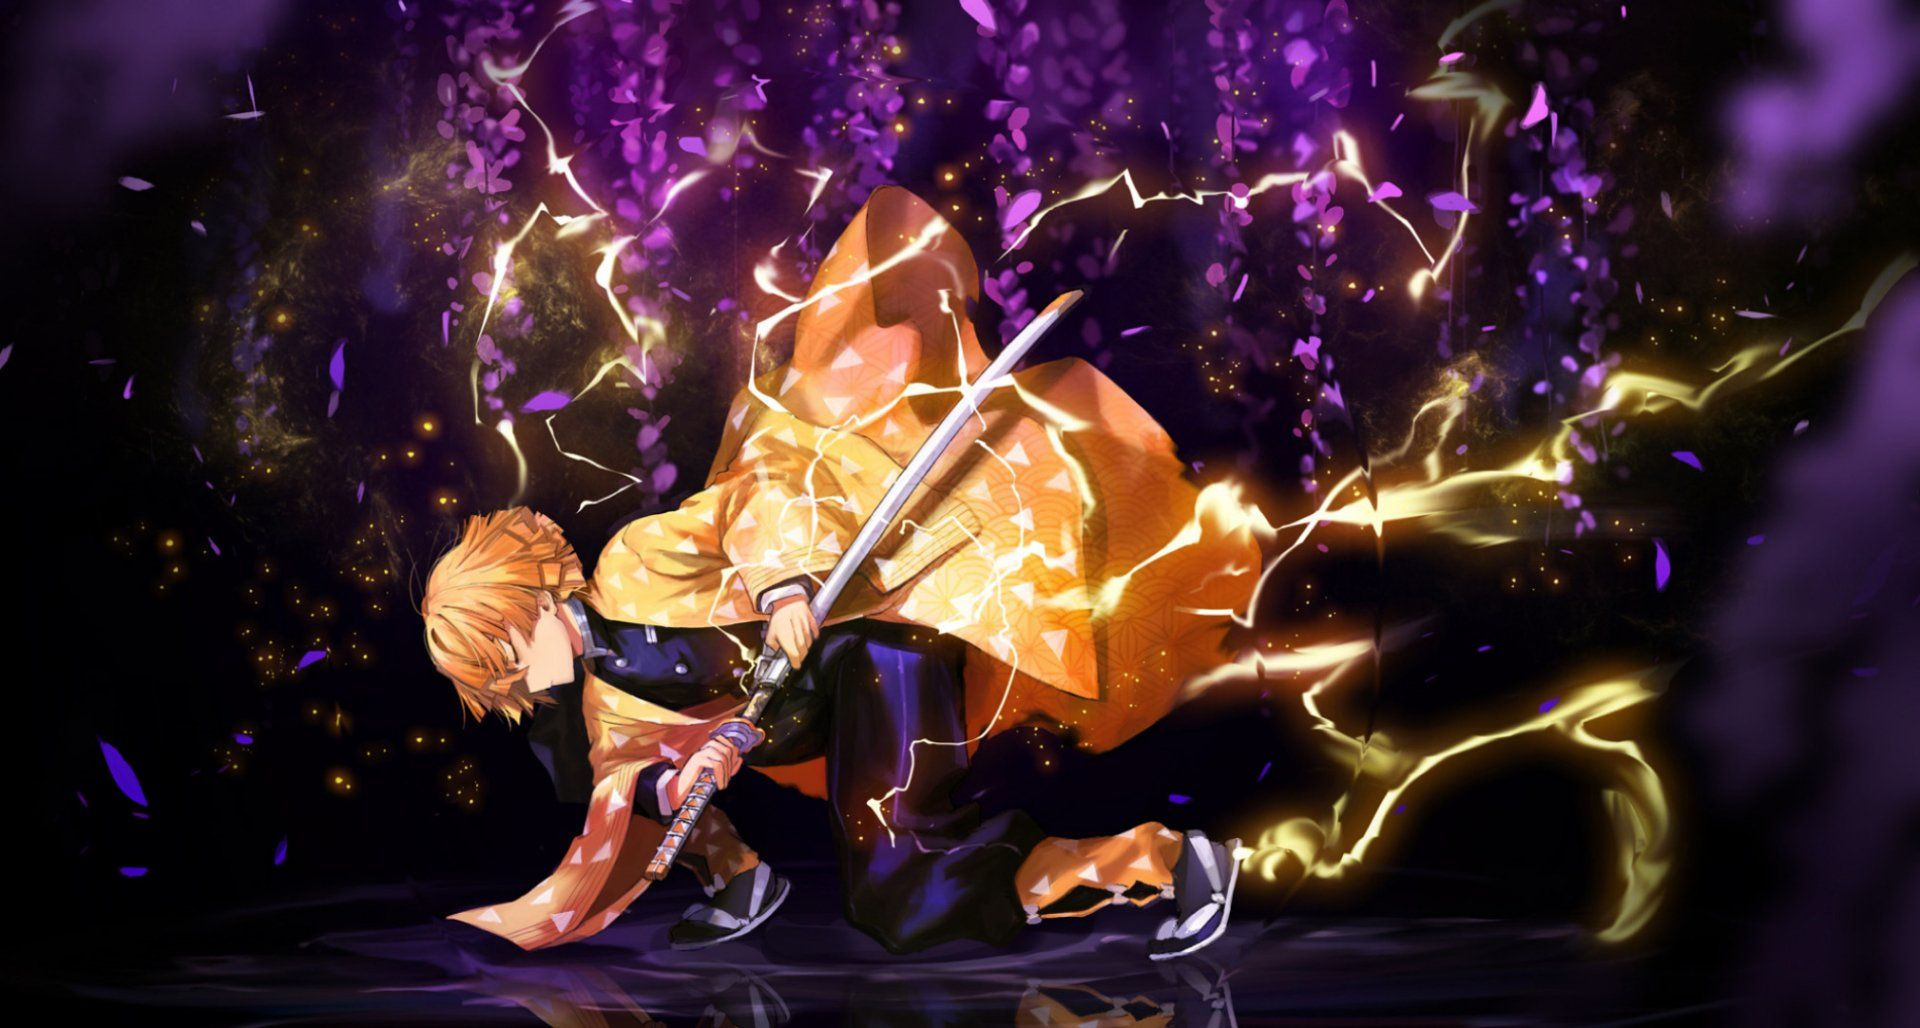 Demon Slayer Zenitsu 4K Wallpapers - Top Free Demon Slayer ...